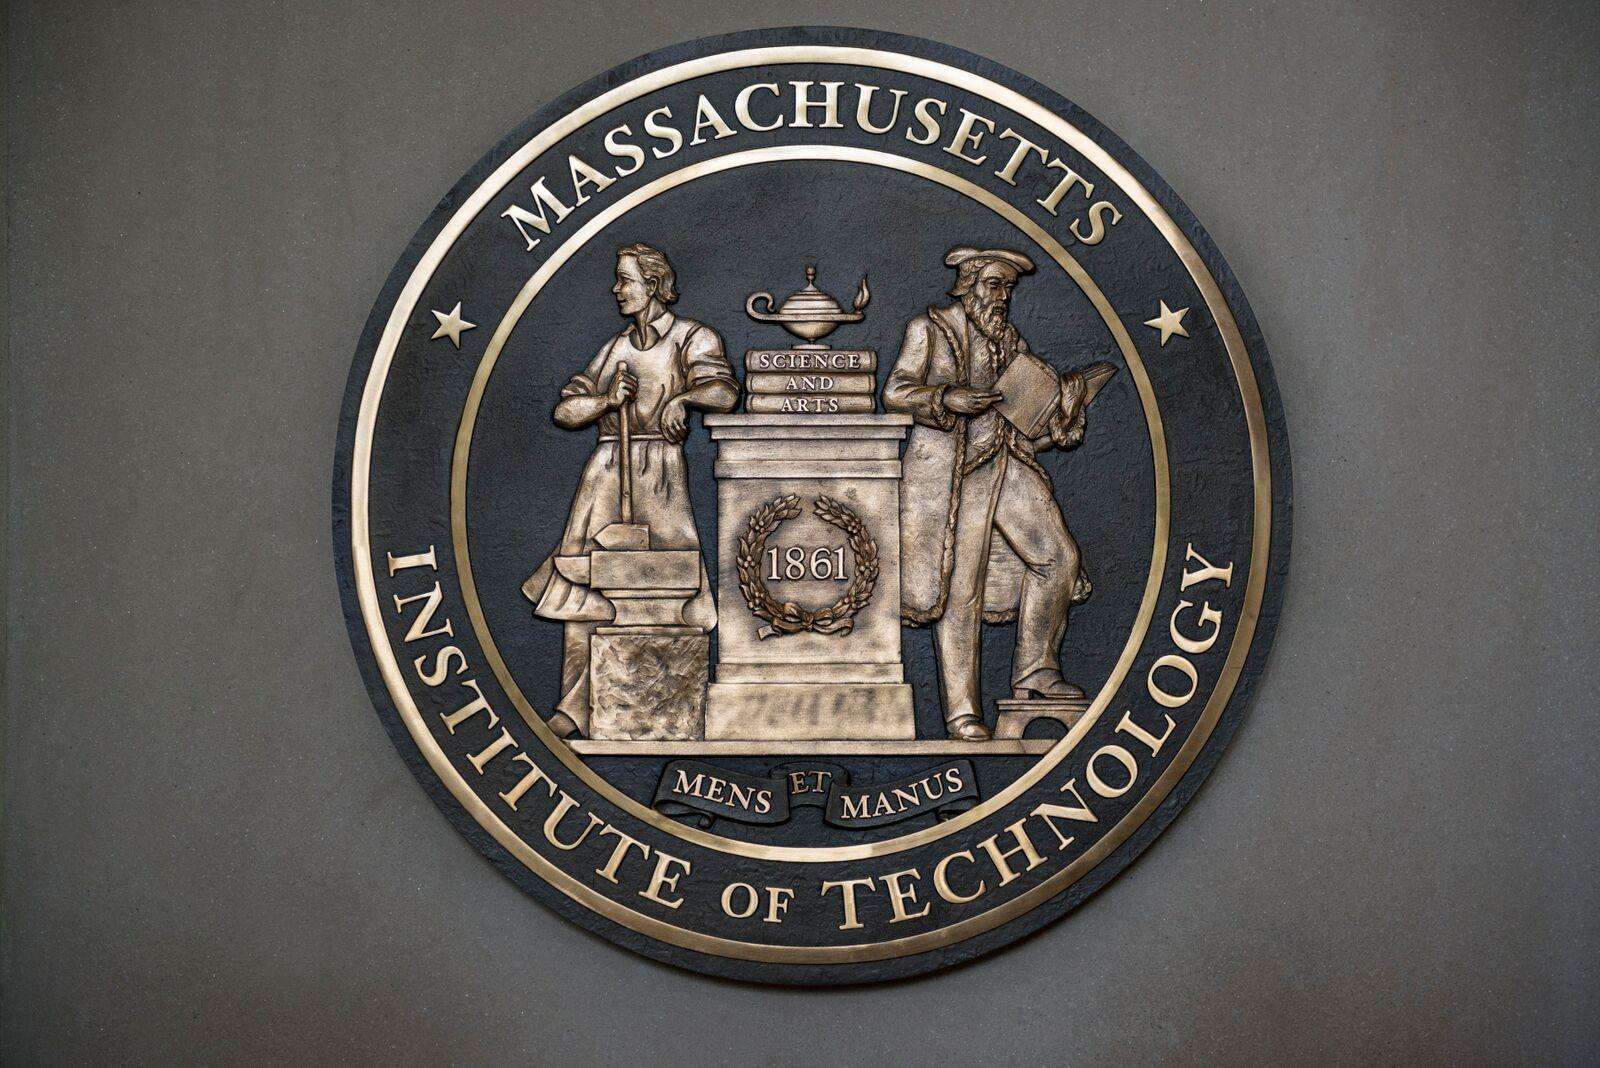 About Mit Mit Massachusetts Institute Of Technology